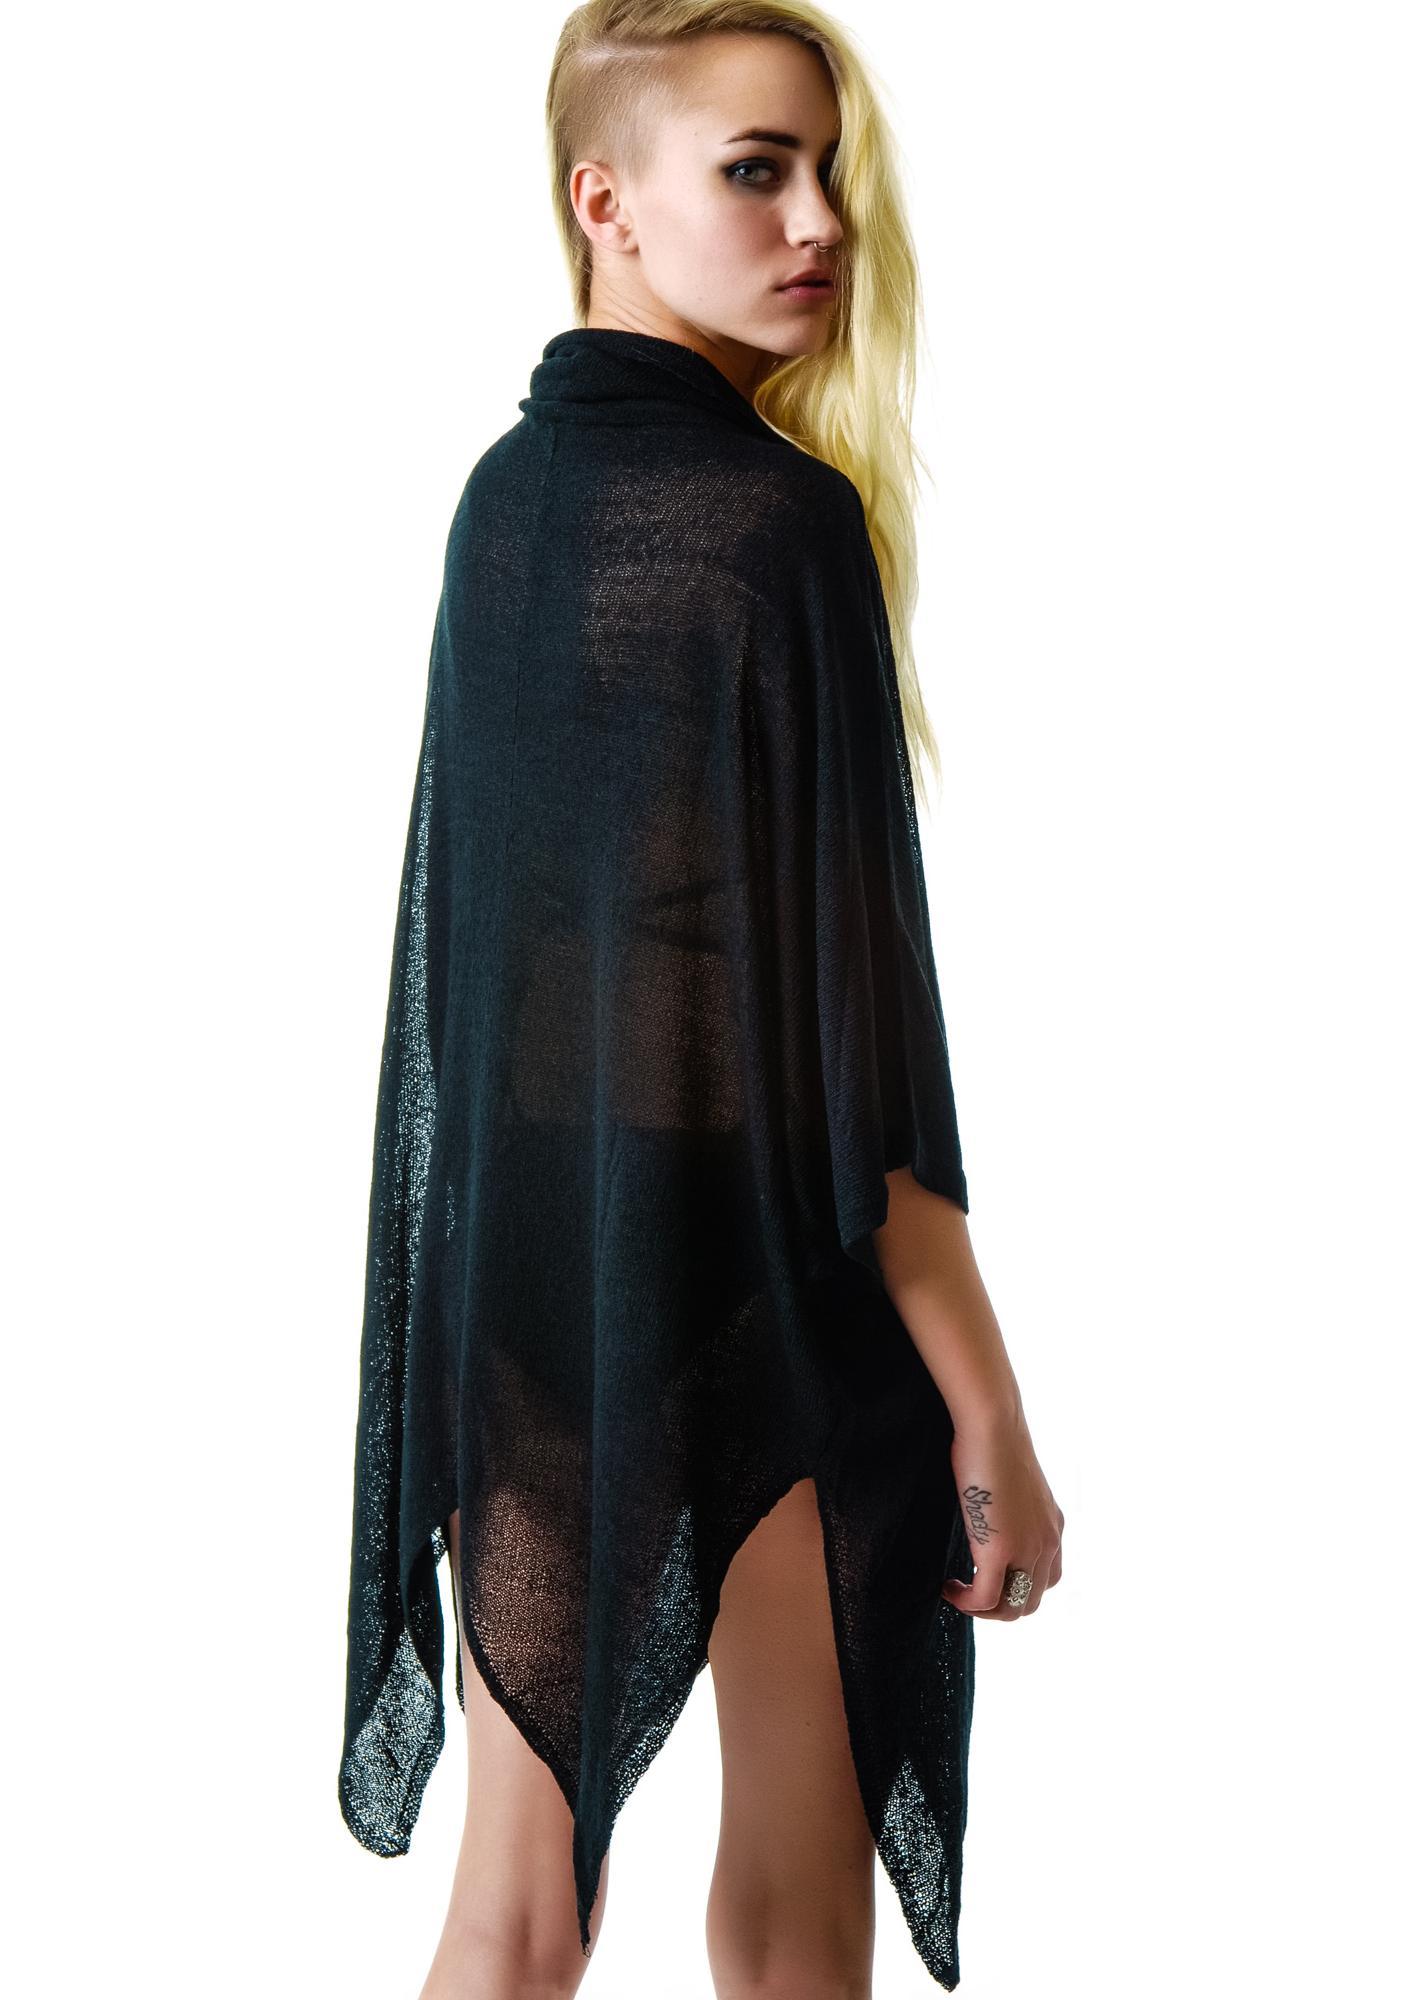 Widow Ghostly Sweater